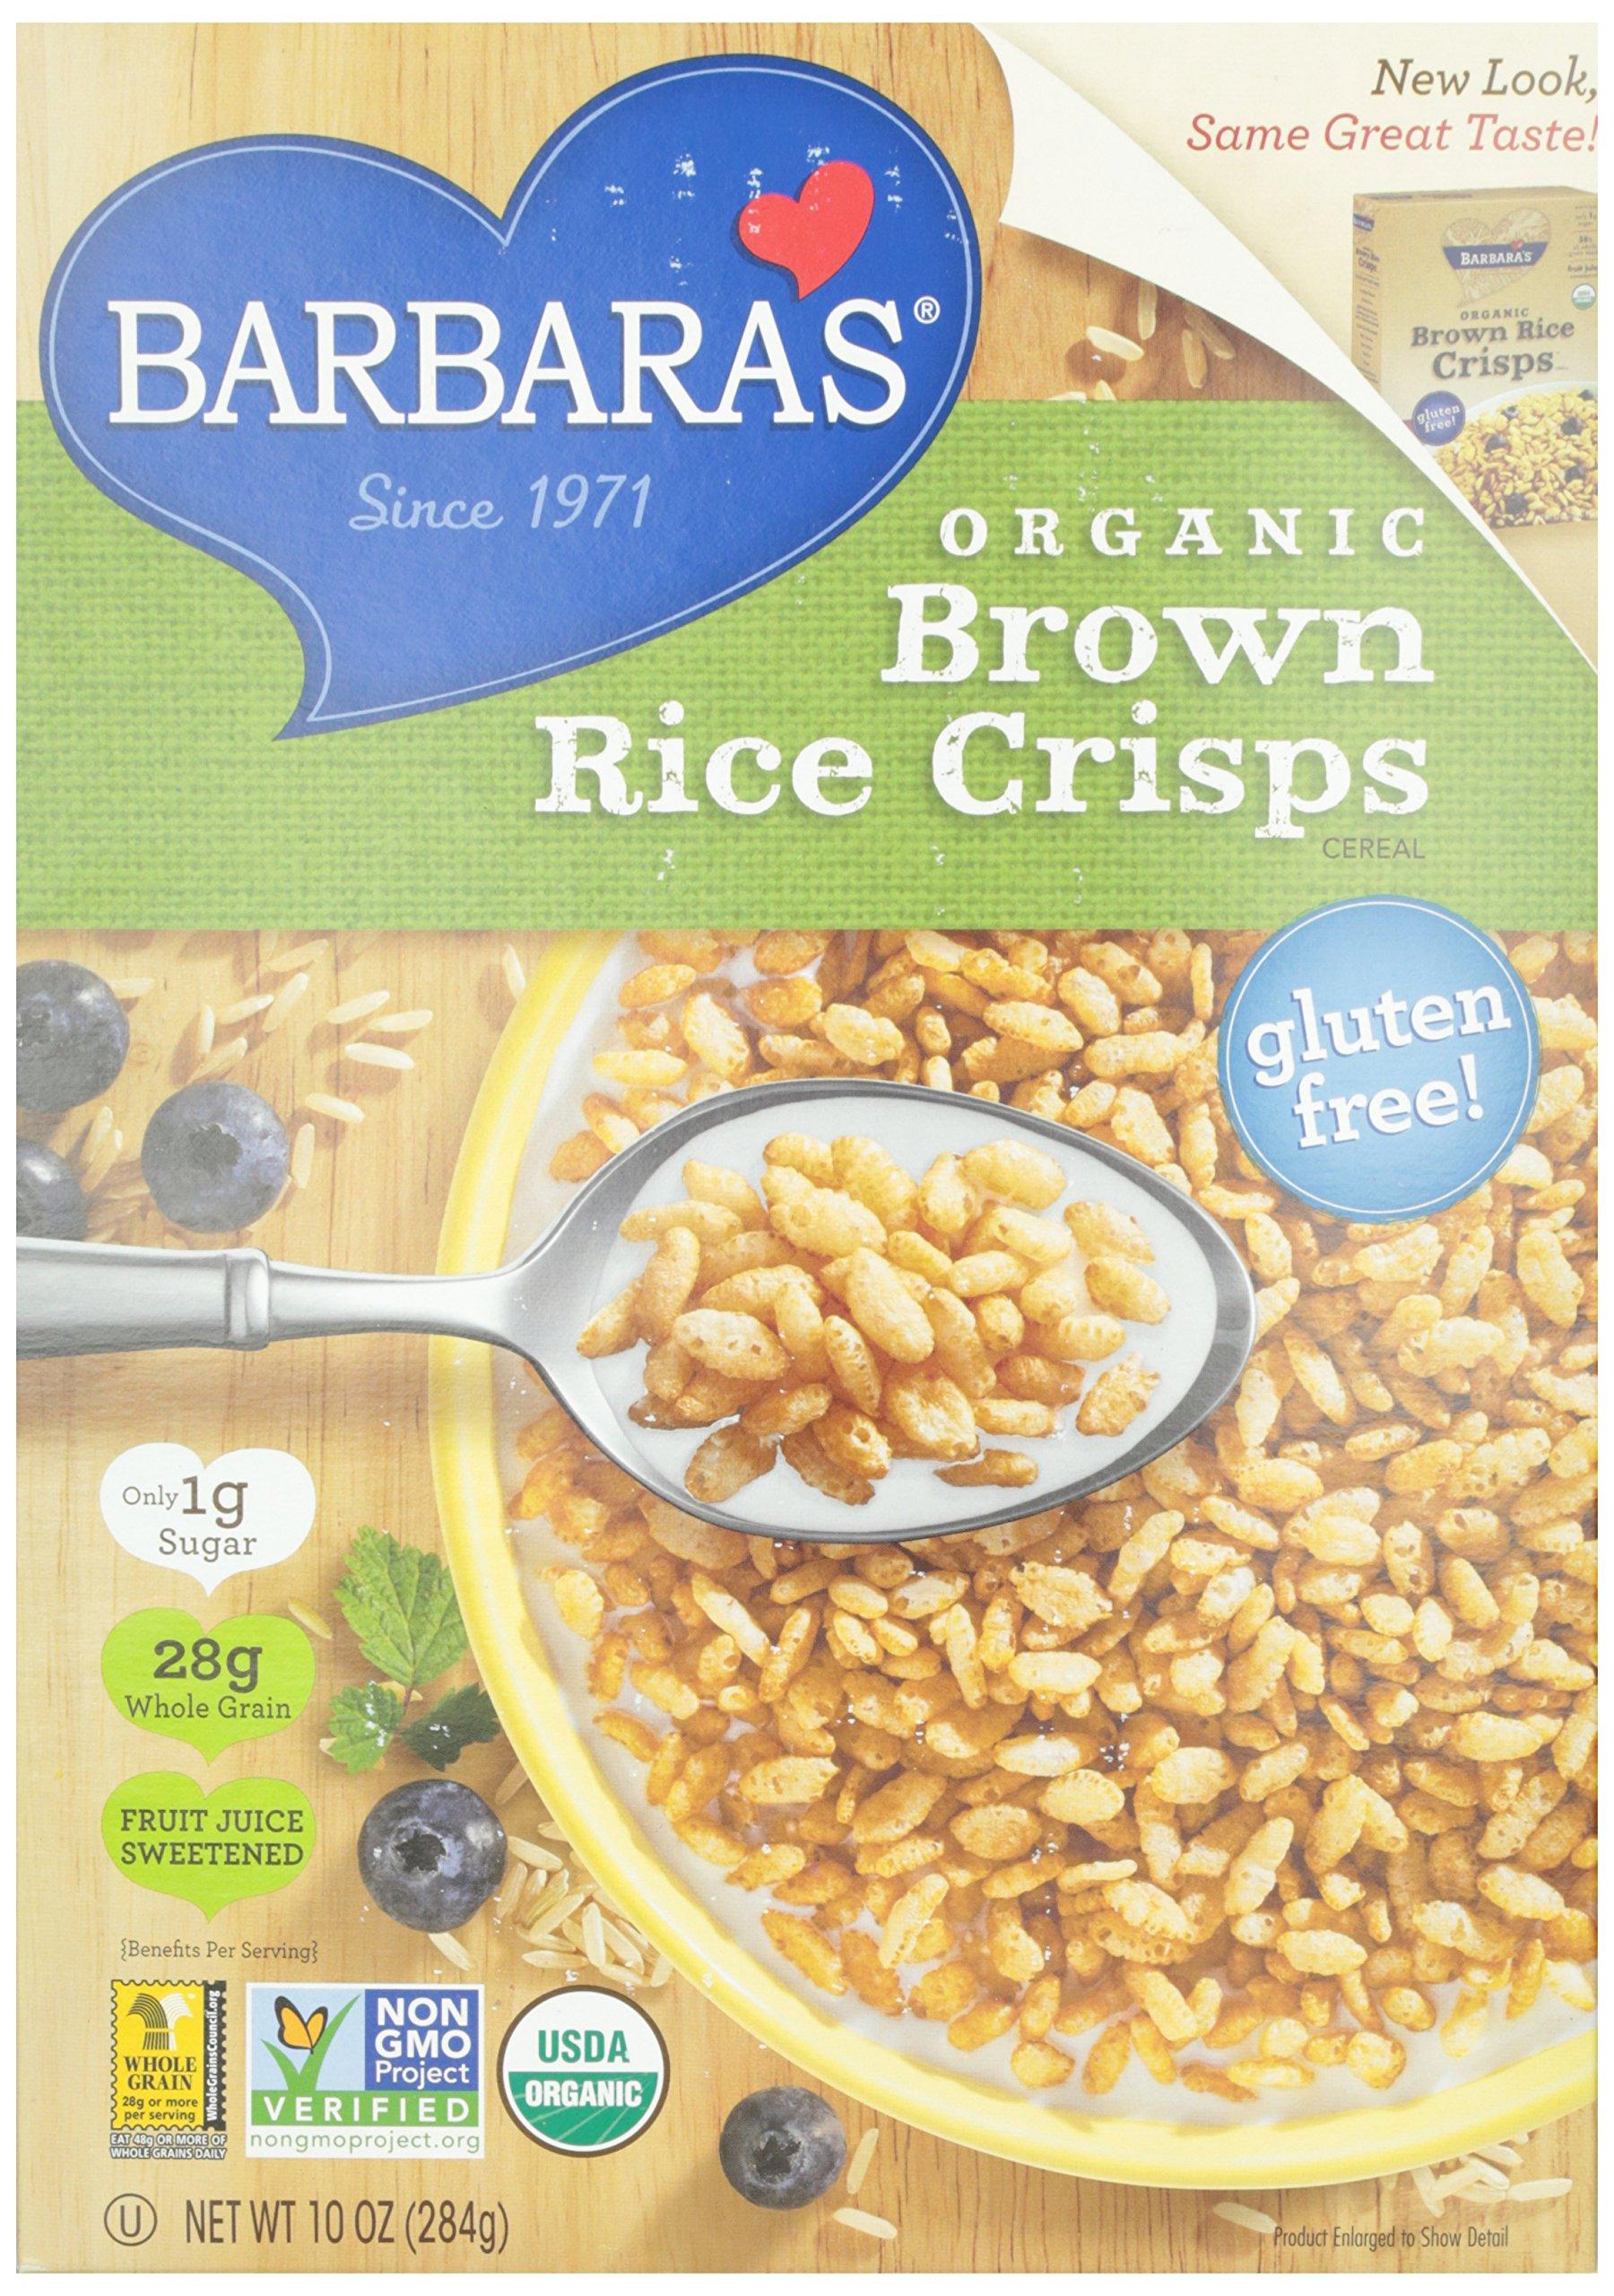 Barbara's Bakery Organic Brown Rice Crisps Cereal, 10 oz by Barbara's Bakery